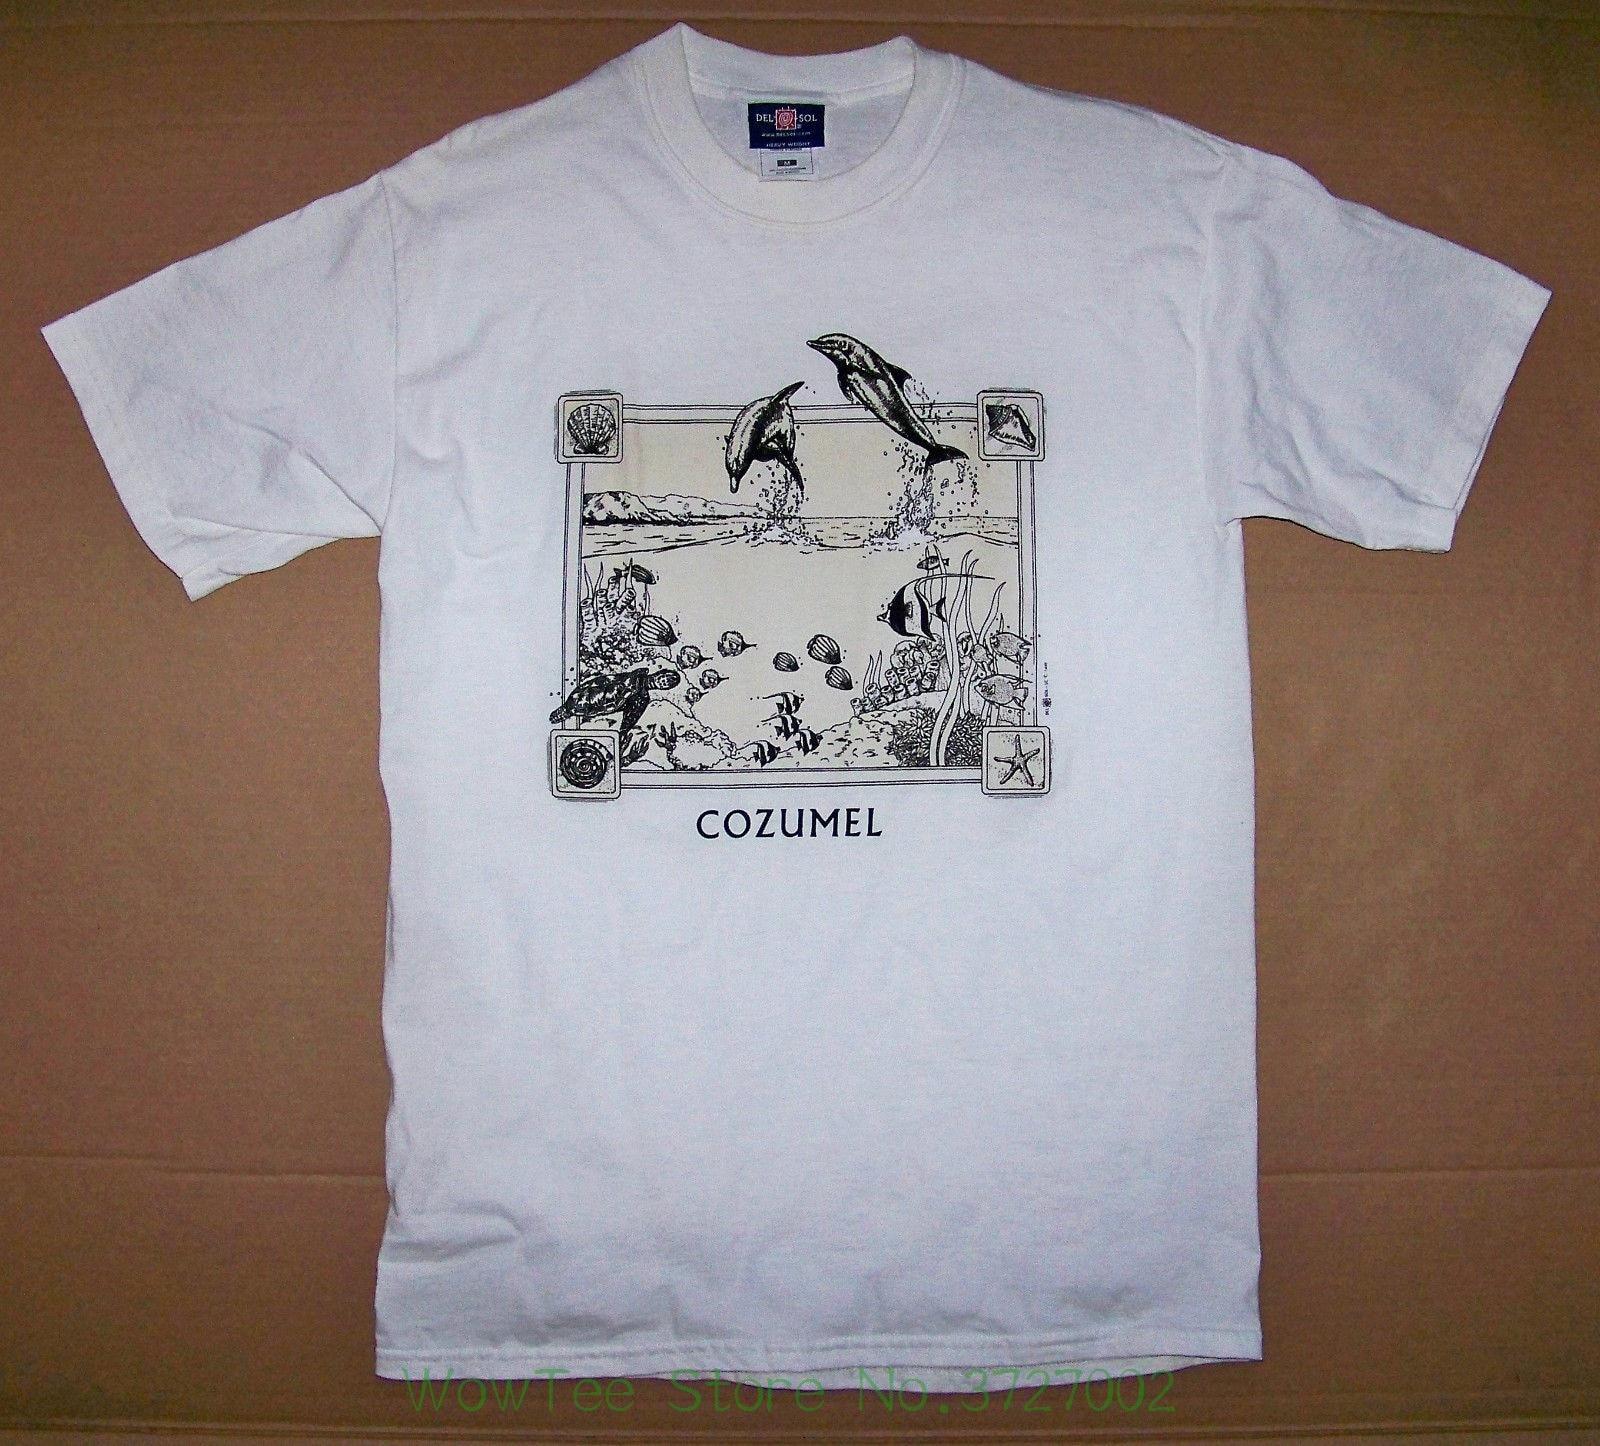 Cozumel / Mexico / Island / Caribbean Sea / 1999 / Seaworld / White T-shirt M Unisex Fashion T Shirt